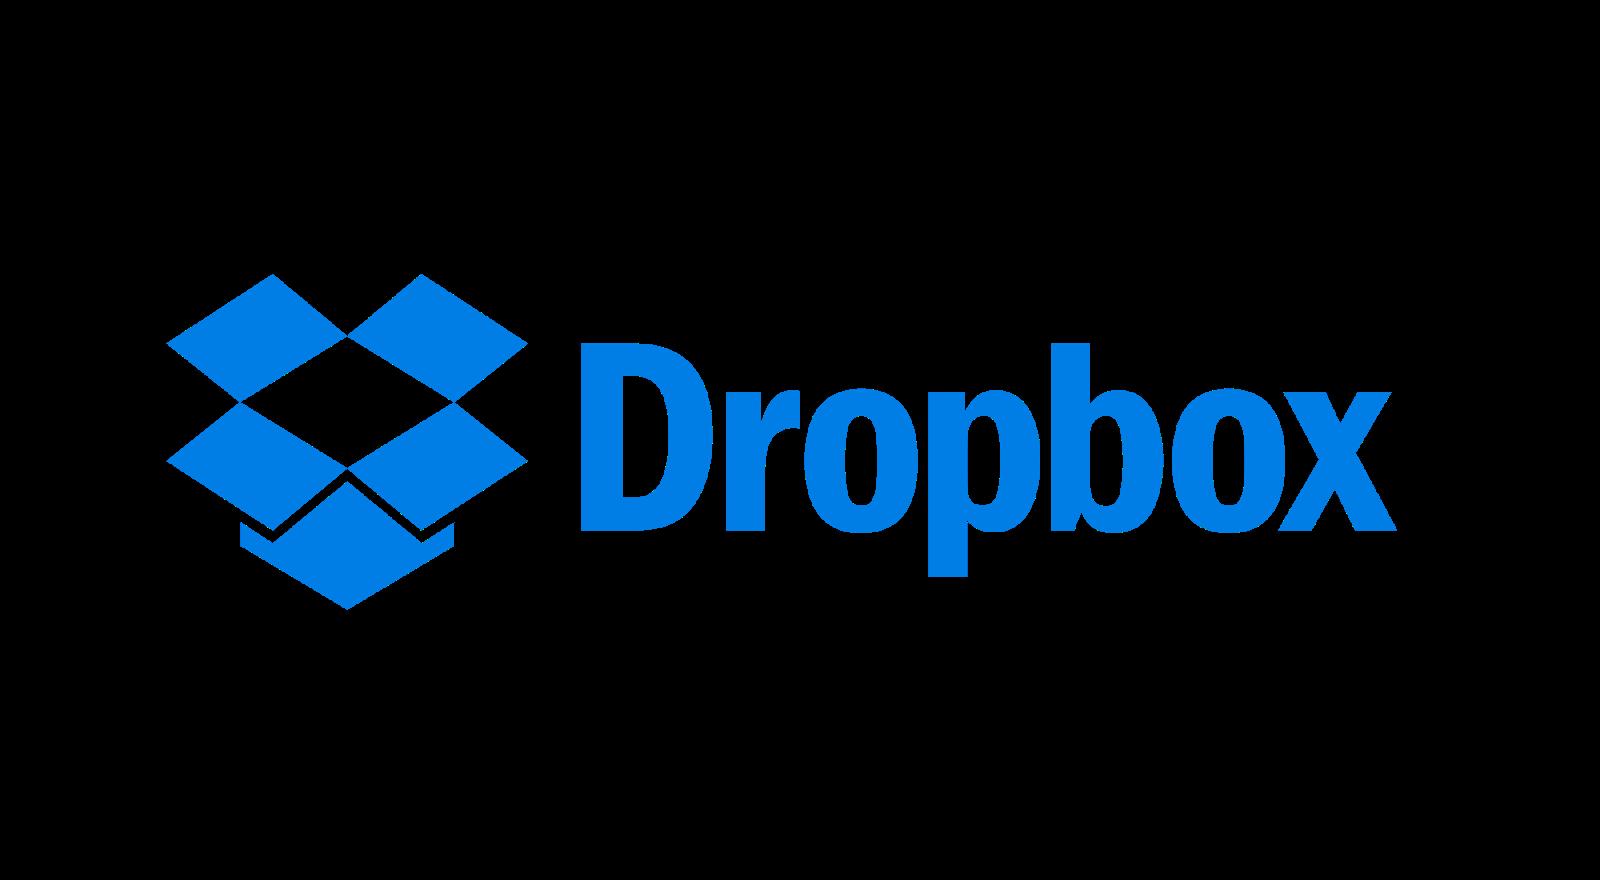 what make Dropbox so popular